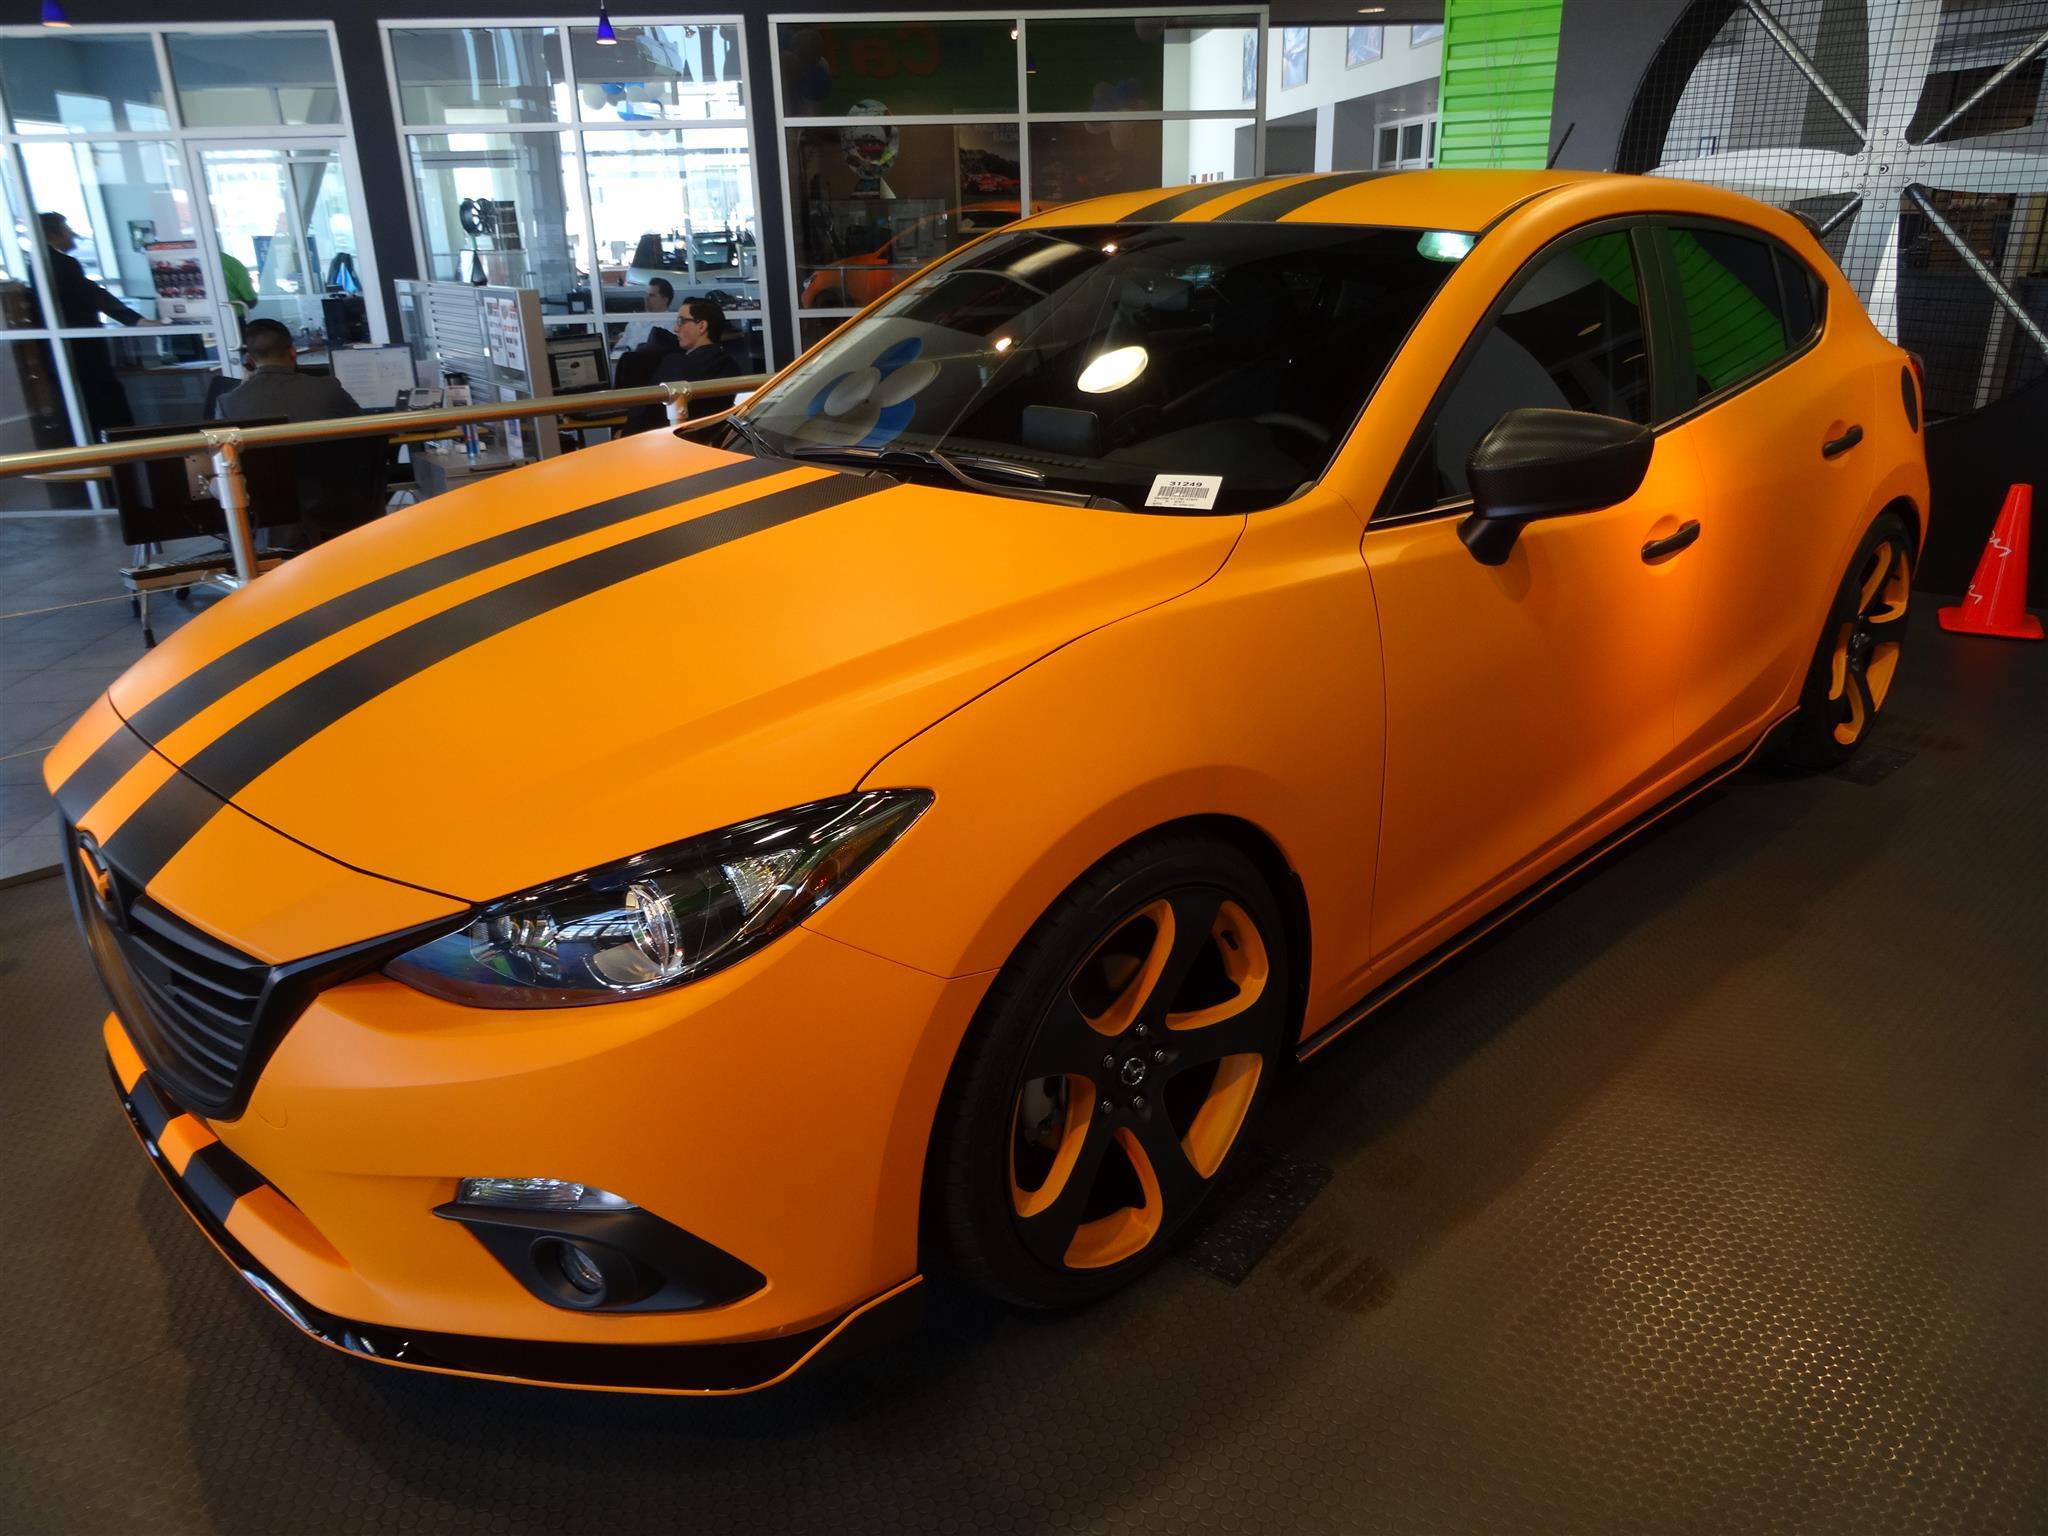 Mazda - MAZDA3 - 2015 - Wheels & Tires - Paint -  Wraps & Body - Performance - Trim & Accessories